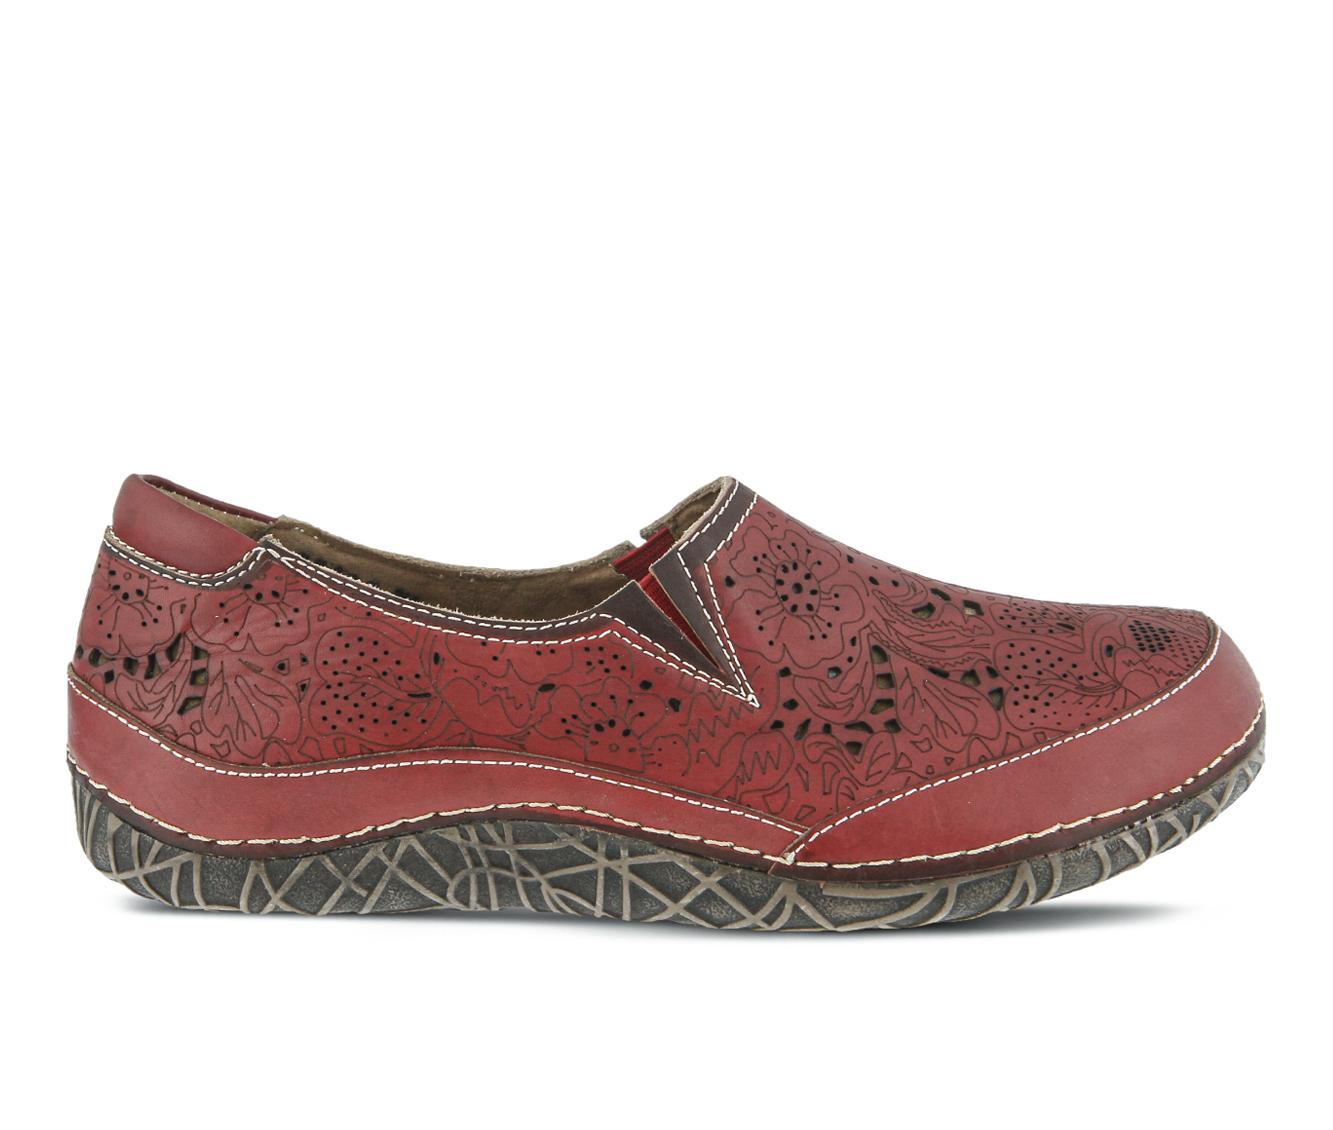 L'Artiste Libora Women's Shoe (Red Leather)